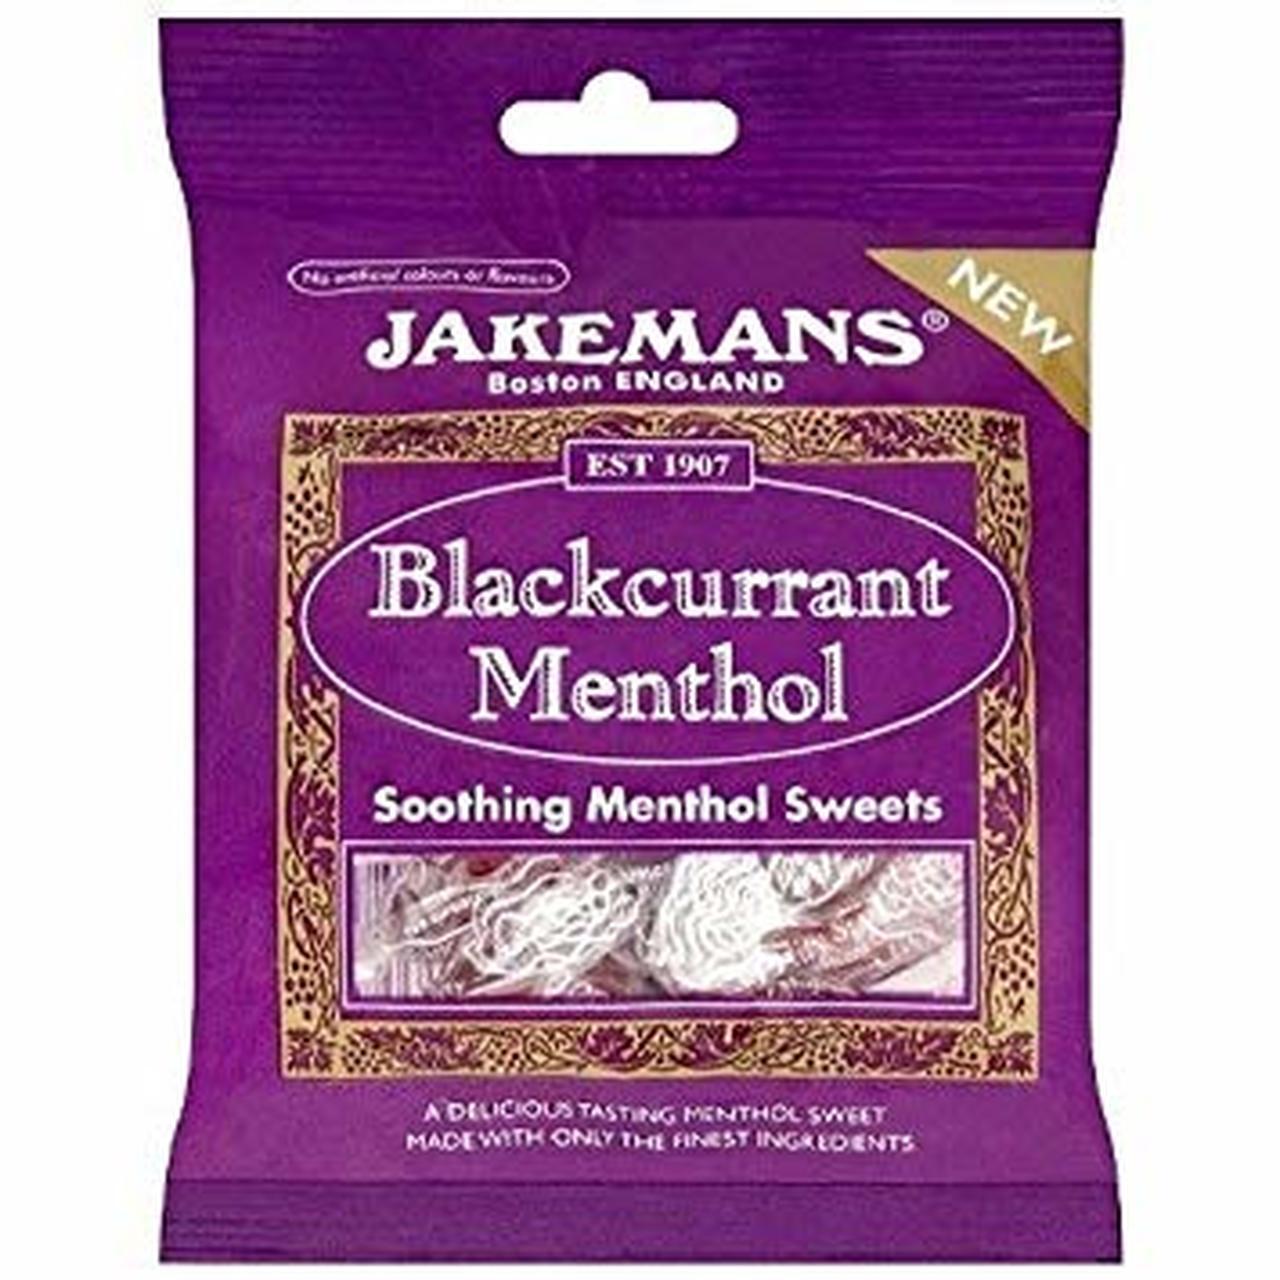 JAKEMANS BLACKCURRANT AND MENTHOL 100G